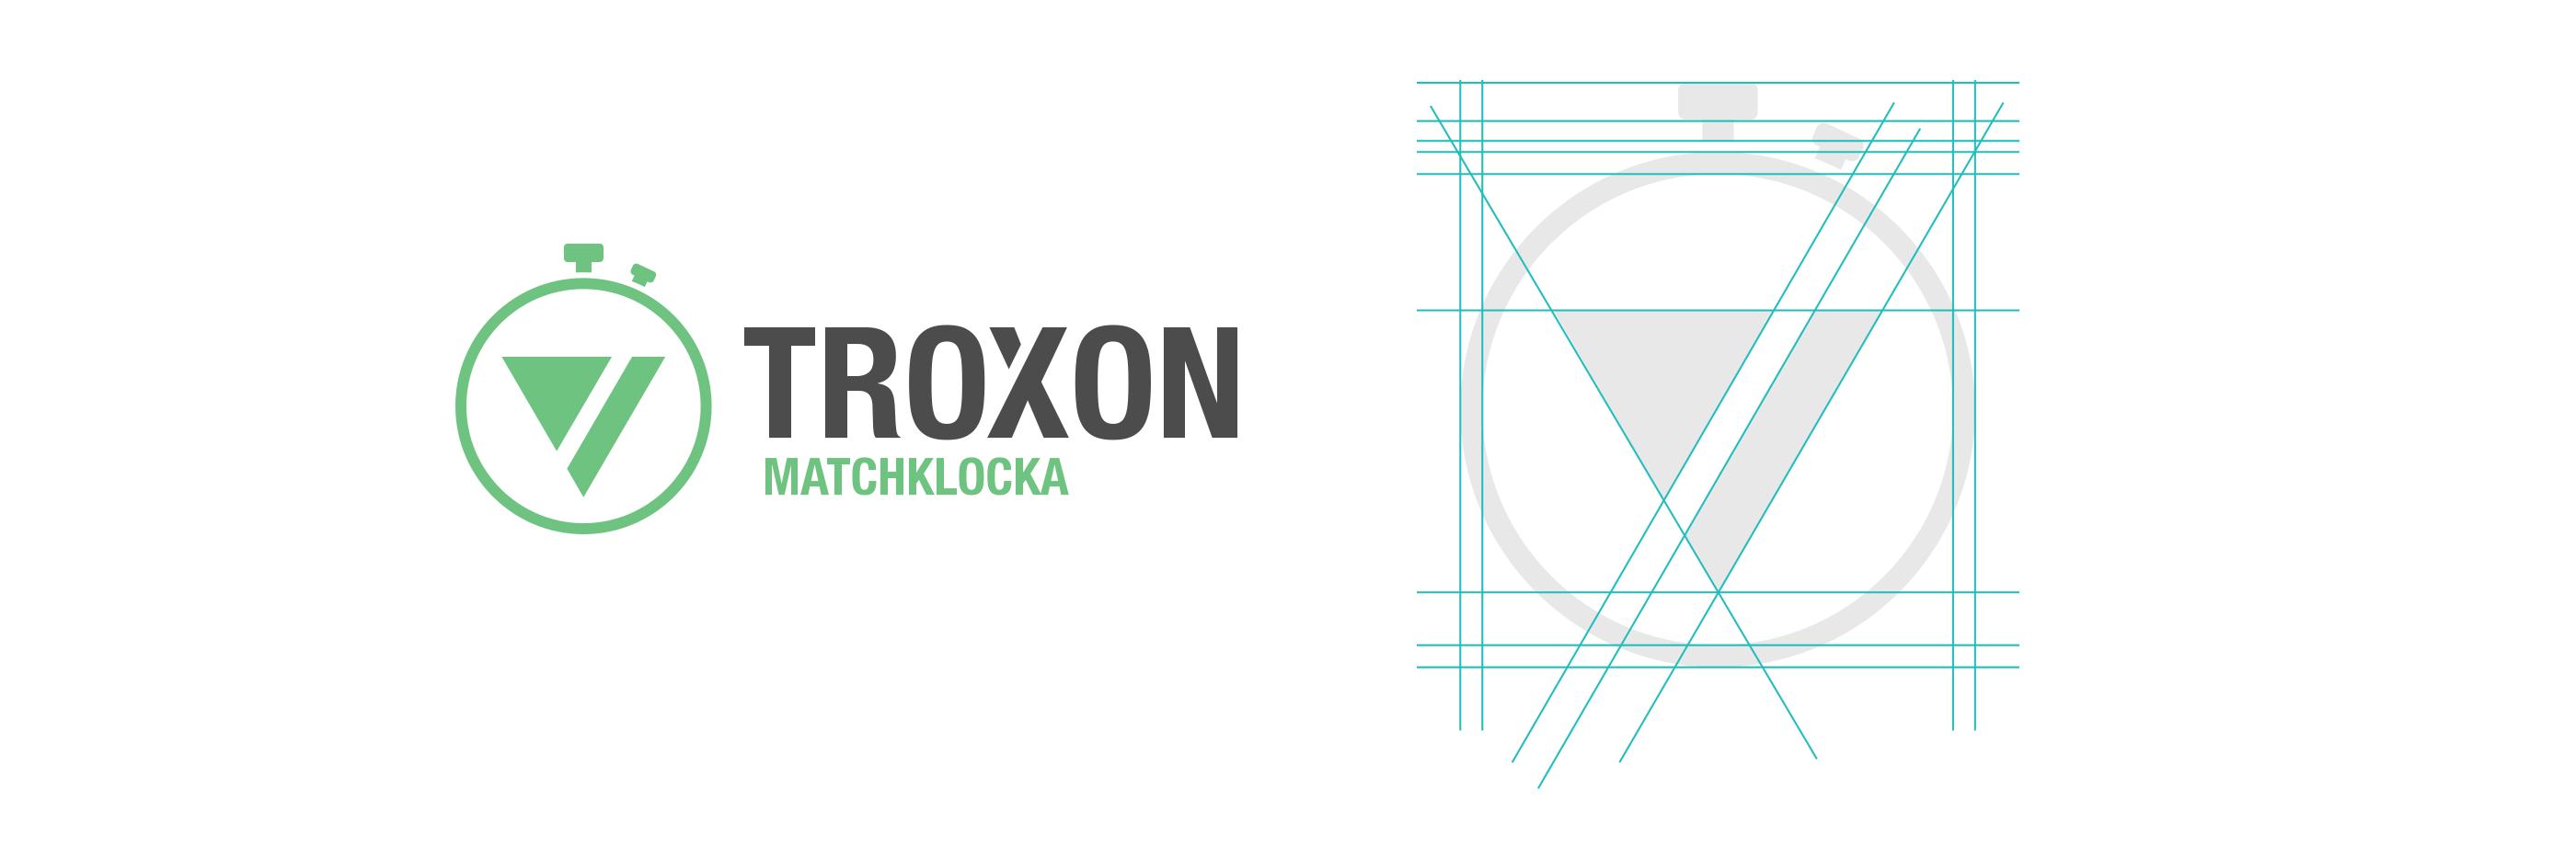 troxon-1